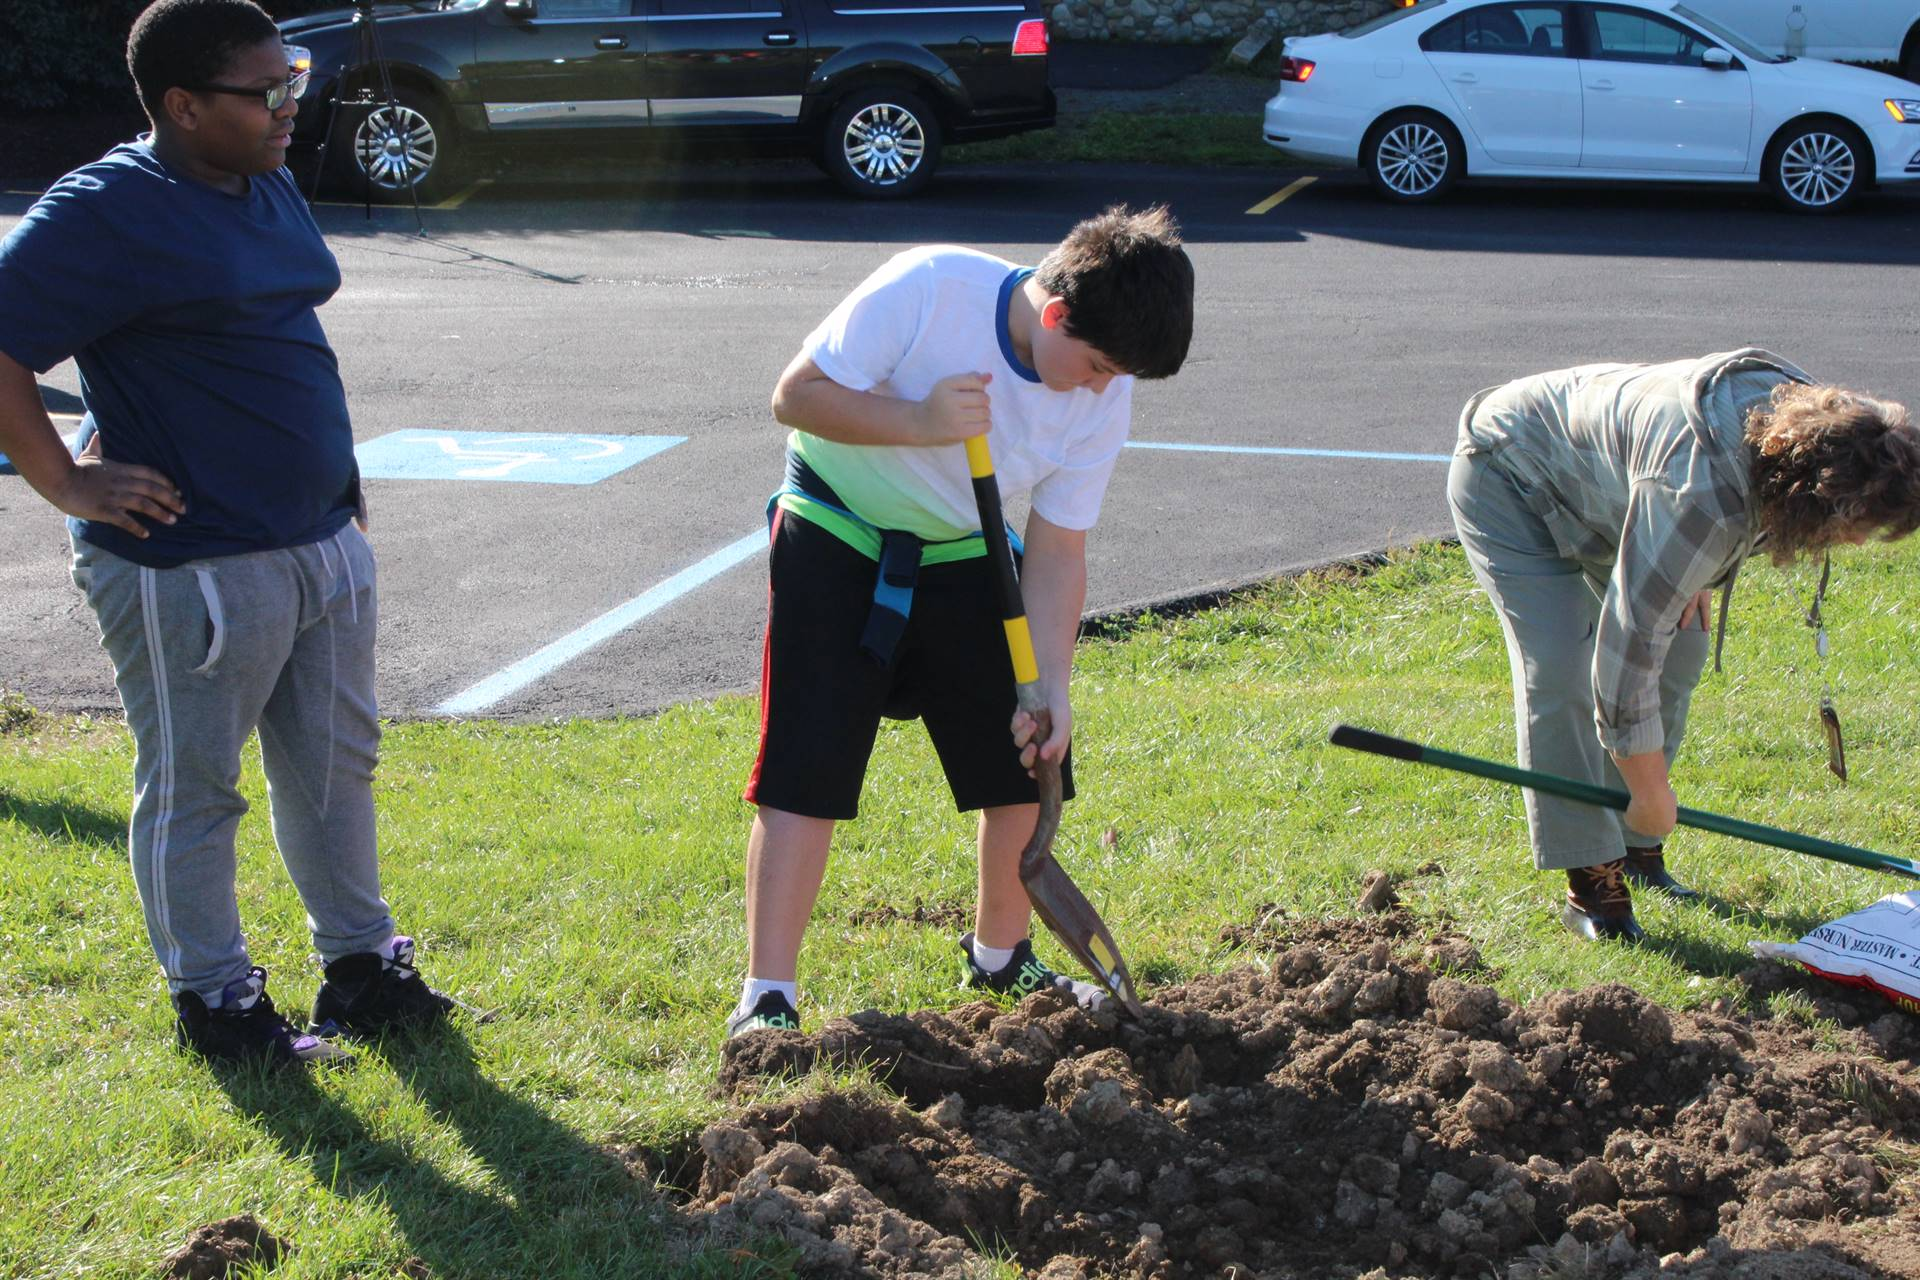 Student shoveling a hole